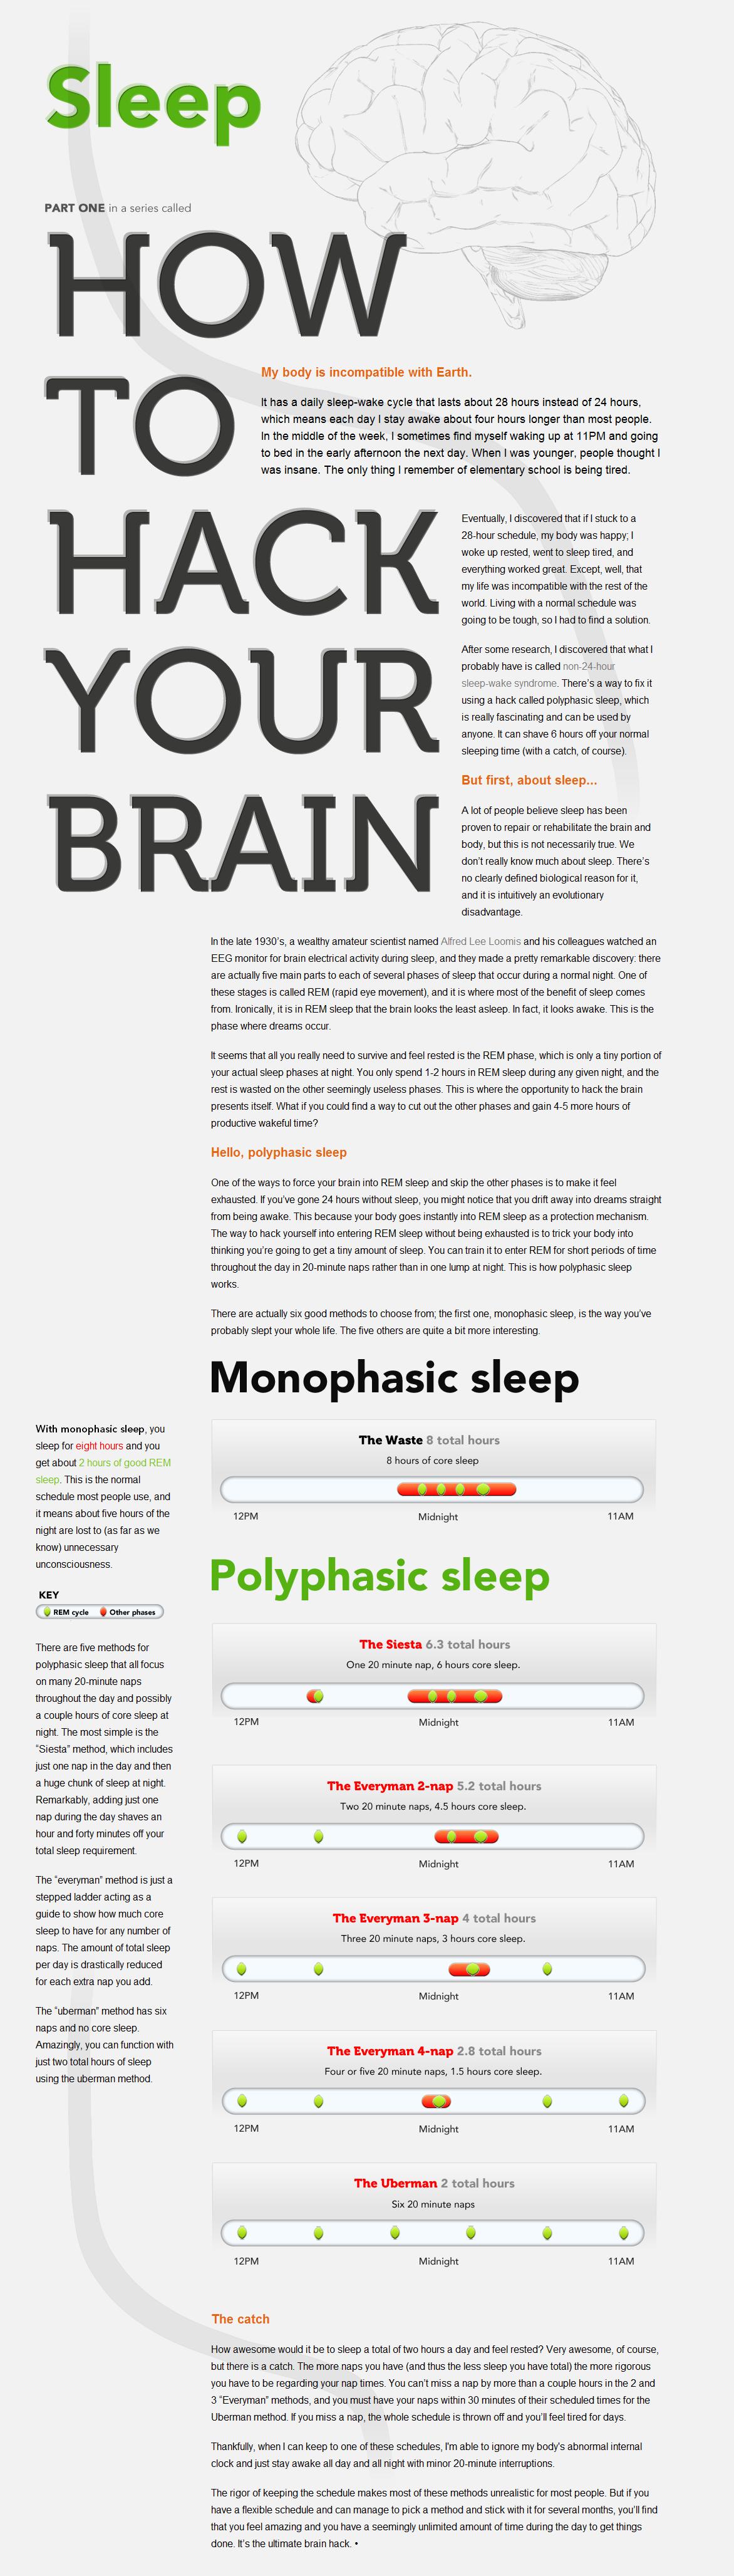 Sleep How to hack your brain. Infographic Brain tricks